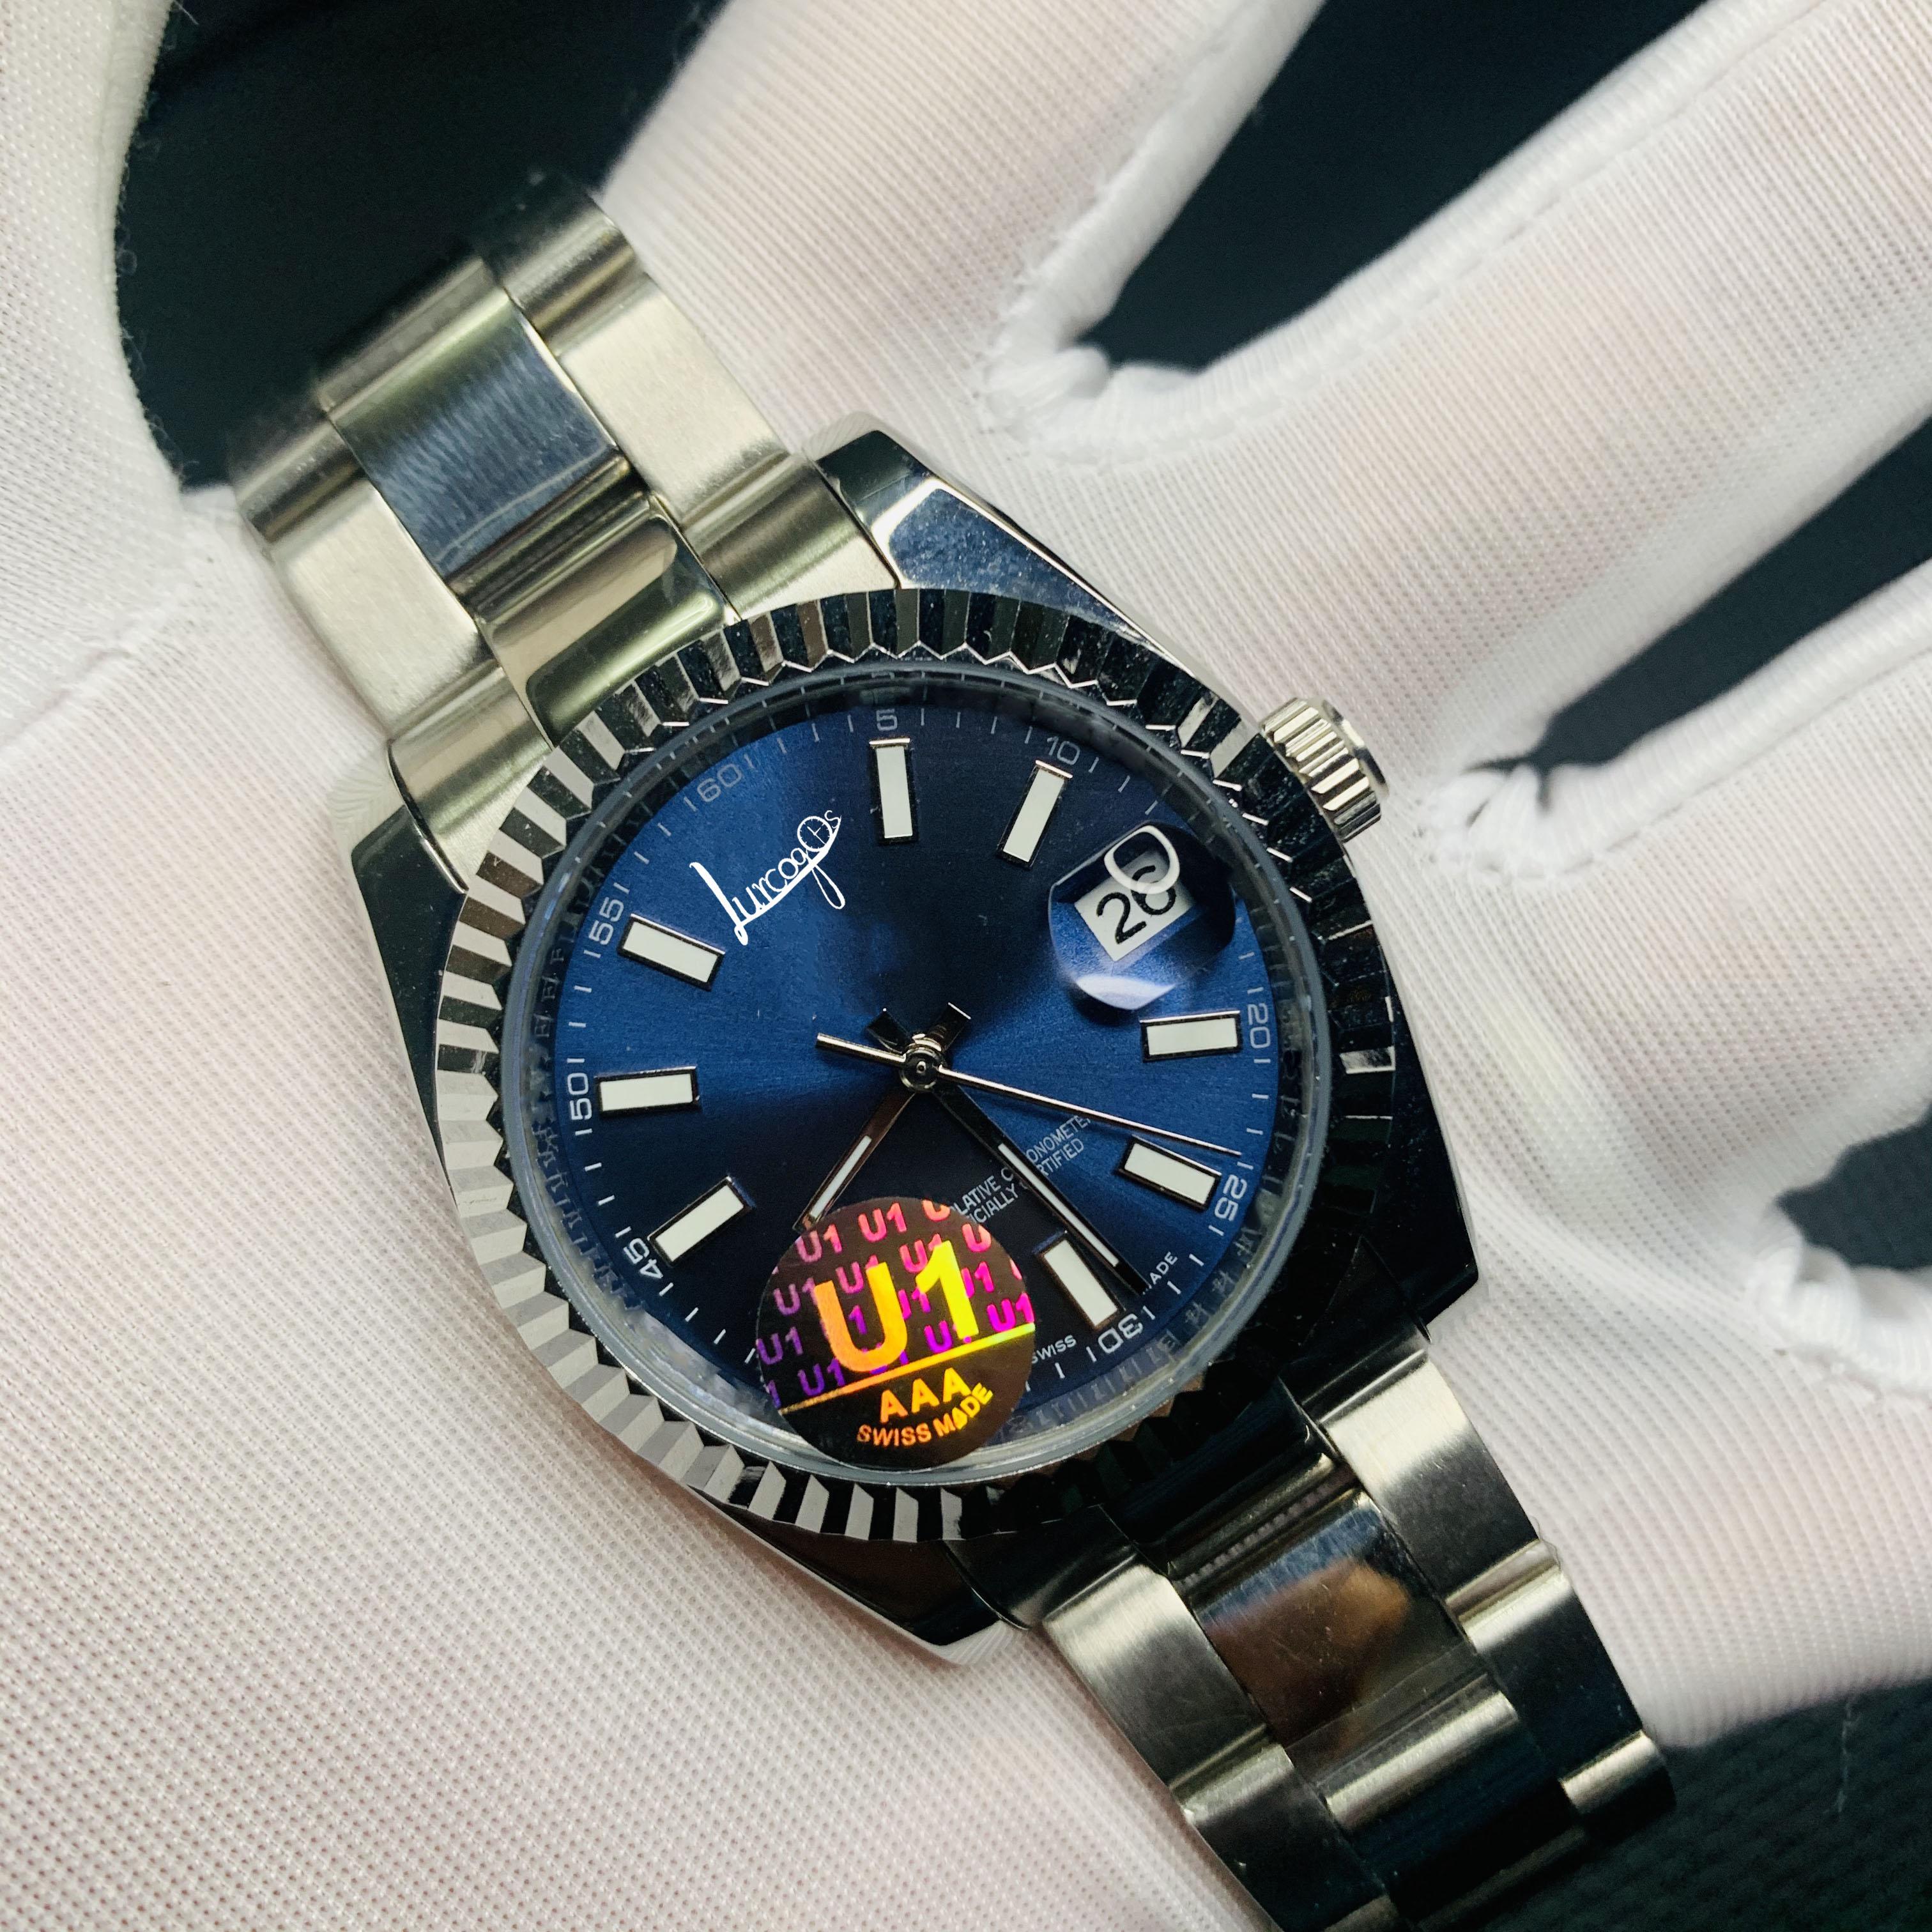 u1 factory luxury watch blue dial 2813 automatic winding movement AIR KING watch sports automatic winding watch sapphire watch